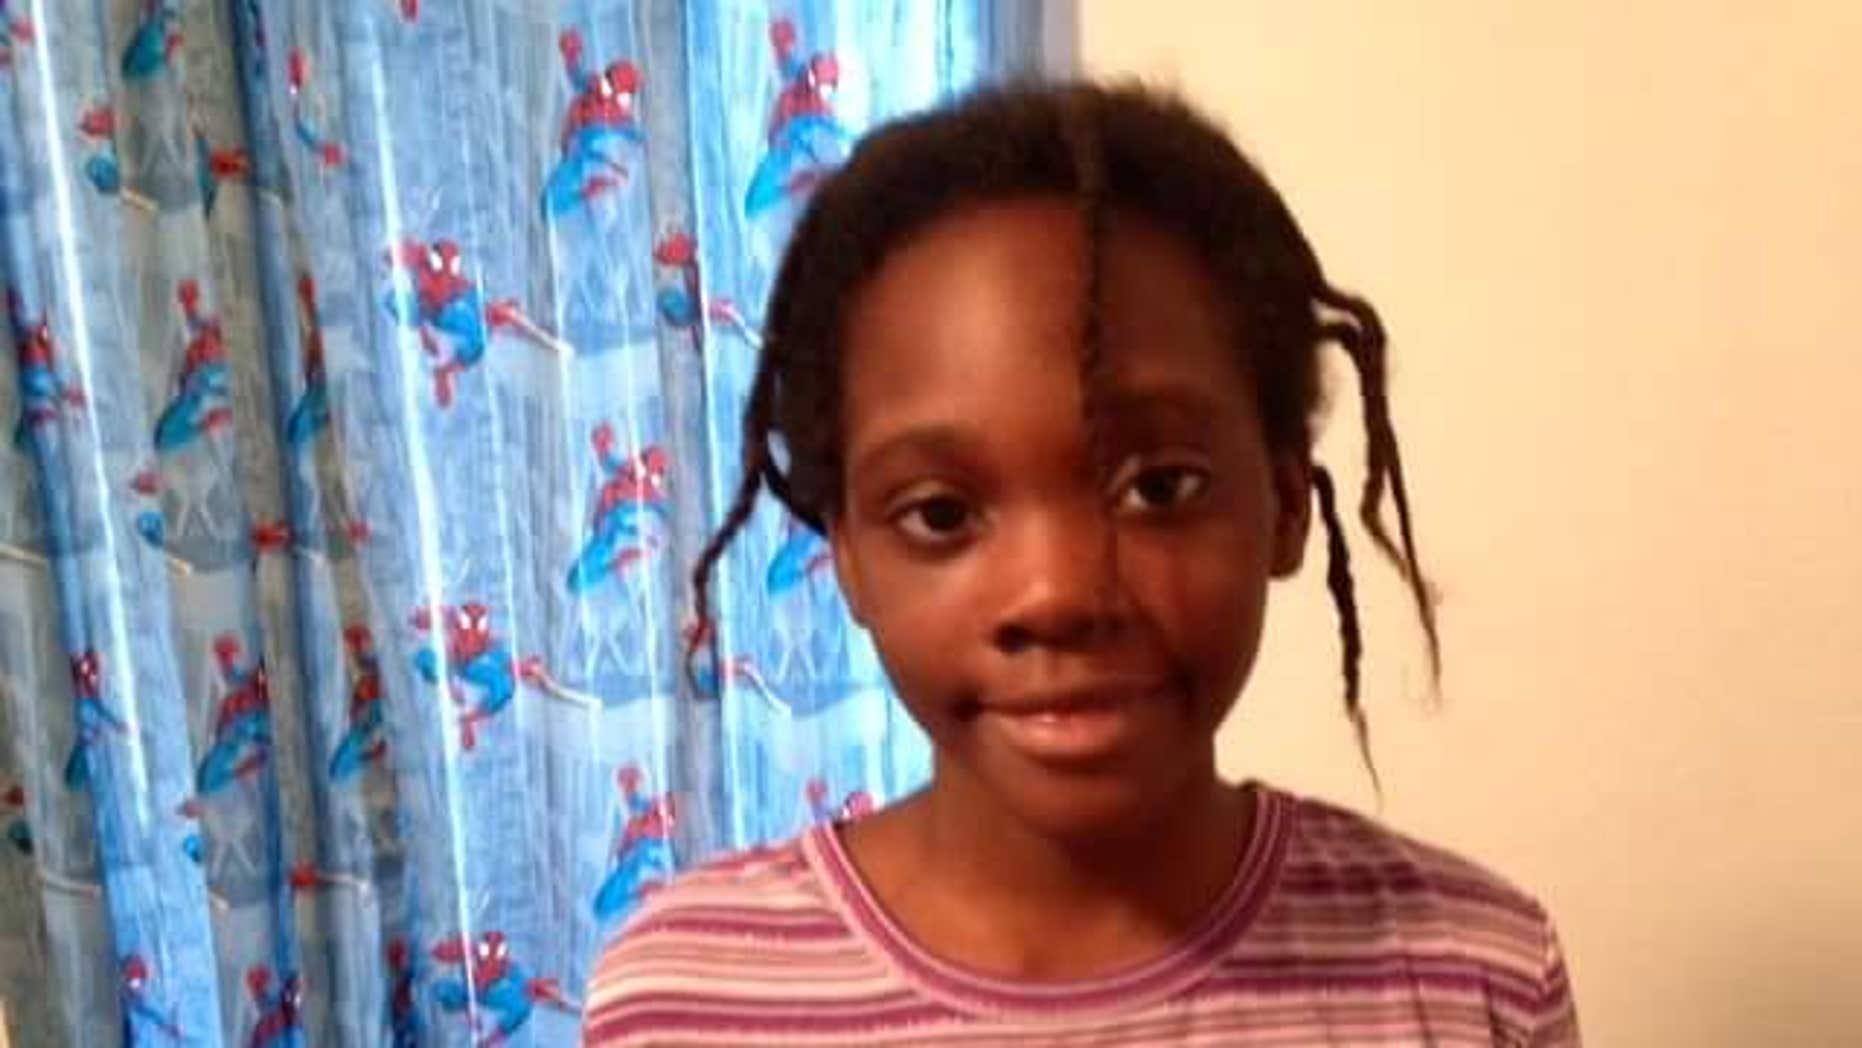 Undated photo of Janiya Thomas, 11, of Bradenton, Florida, who was last seen in September 2014. (Bradenton Police)